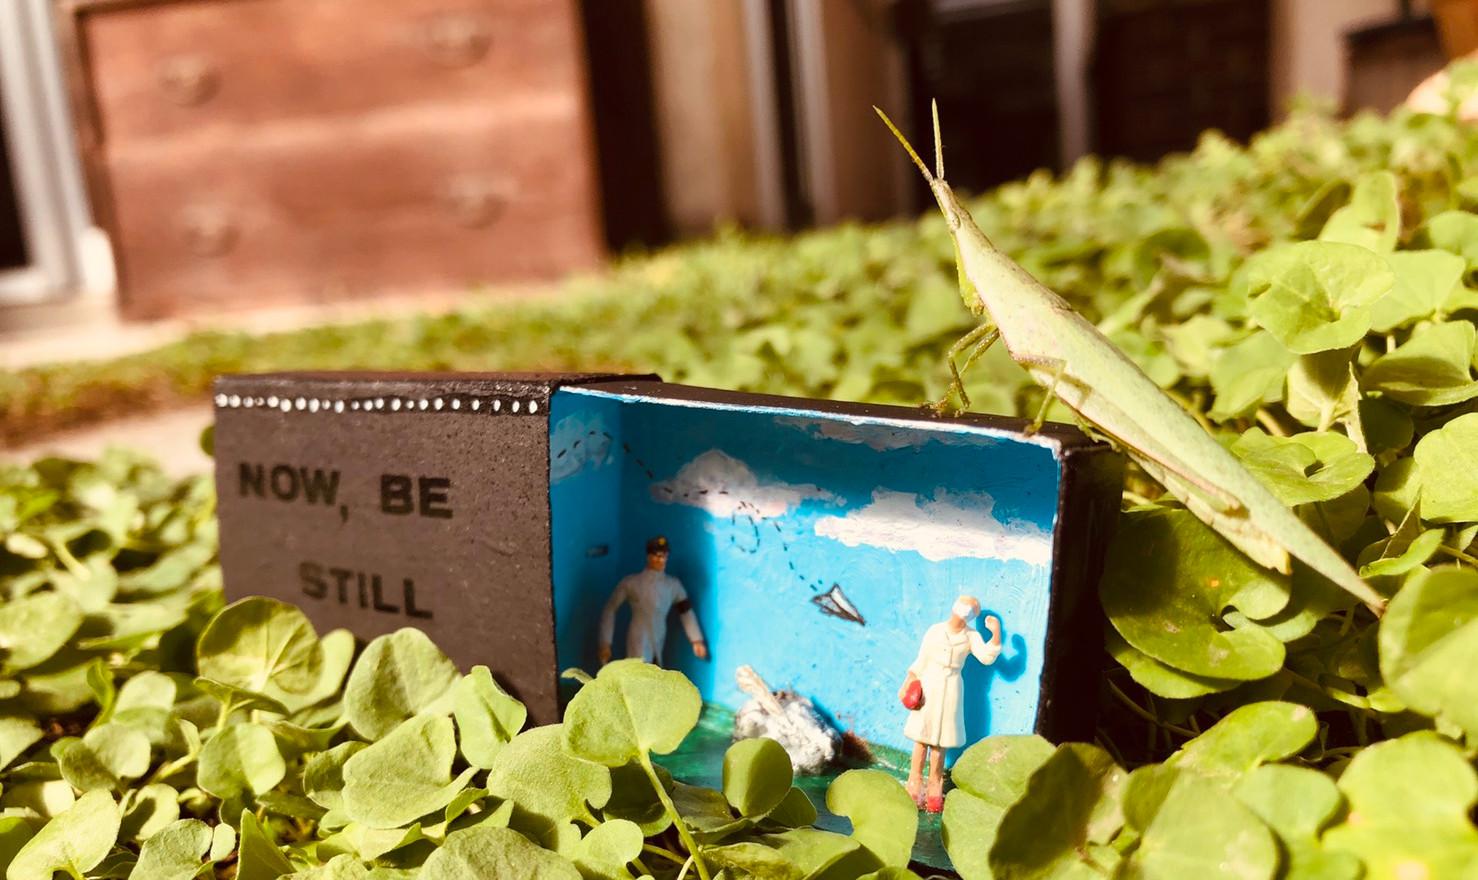 Grasshopper photo-bomb in Okayama City, Okayama Prefecture, Japan